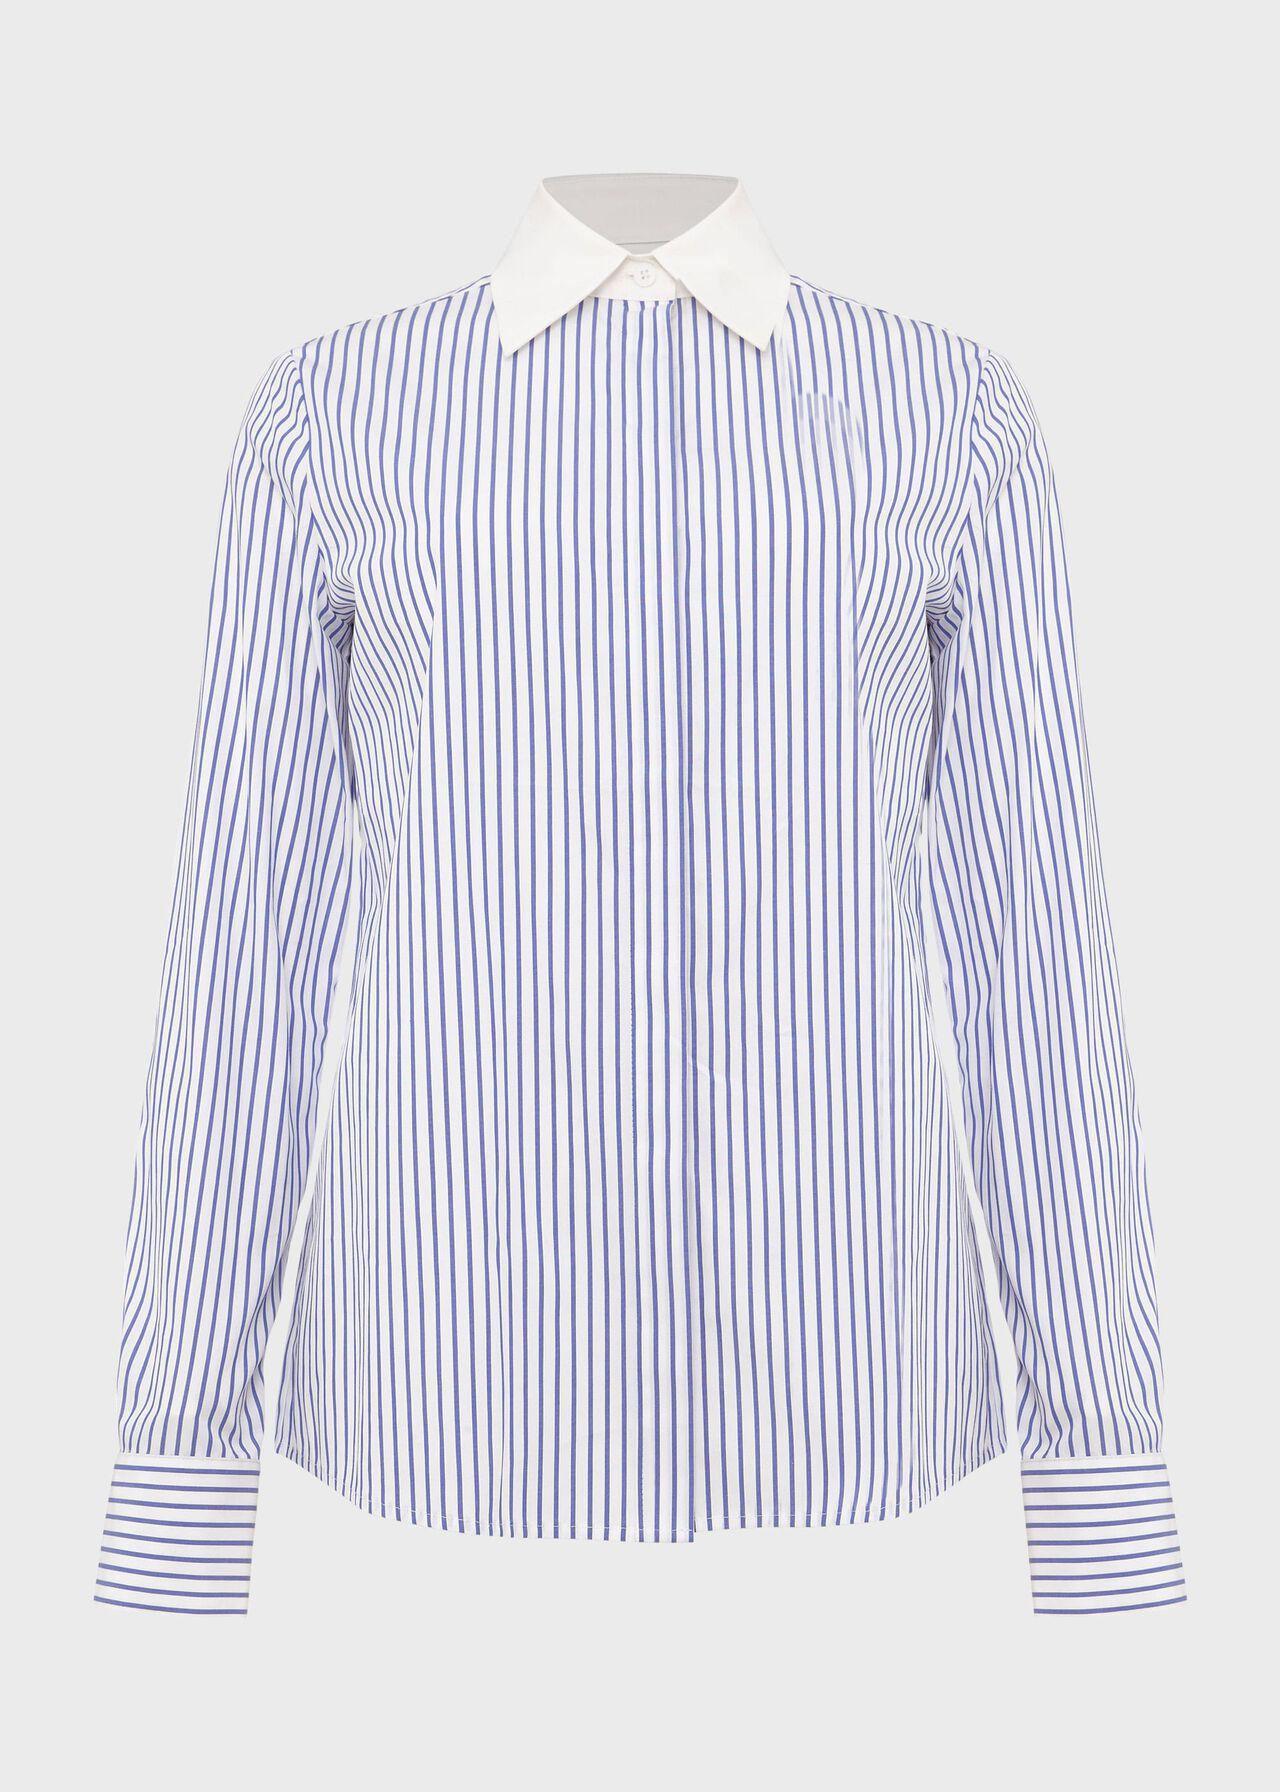 Talia Cotton Blend Stripe Shirt, Blue Ivory, hi-res